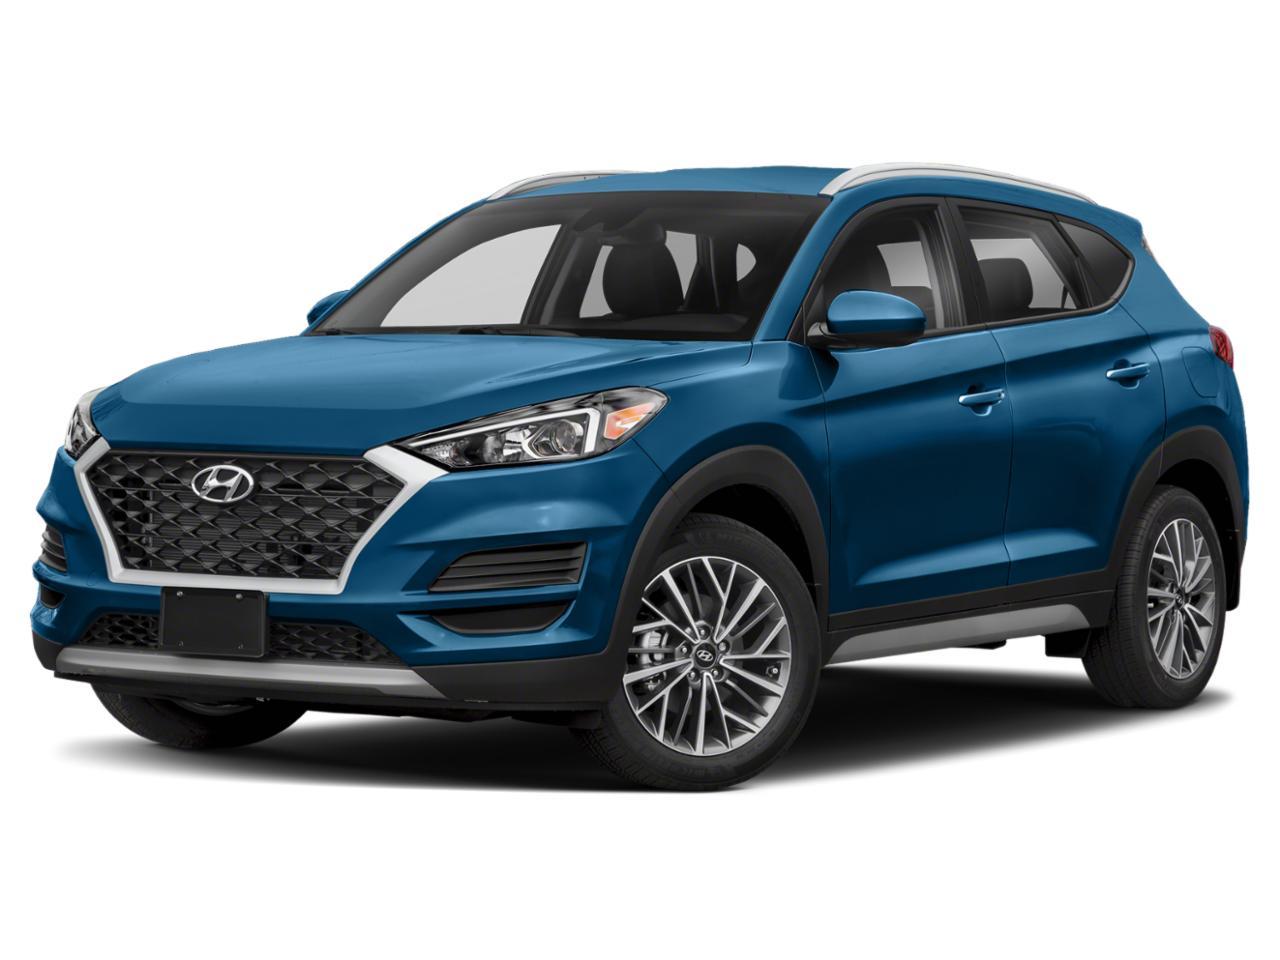 2019 Hyundai Tucson Vehicle Photo in Appleton, WI 54913